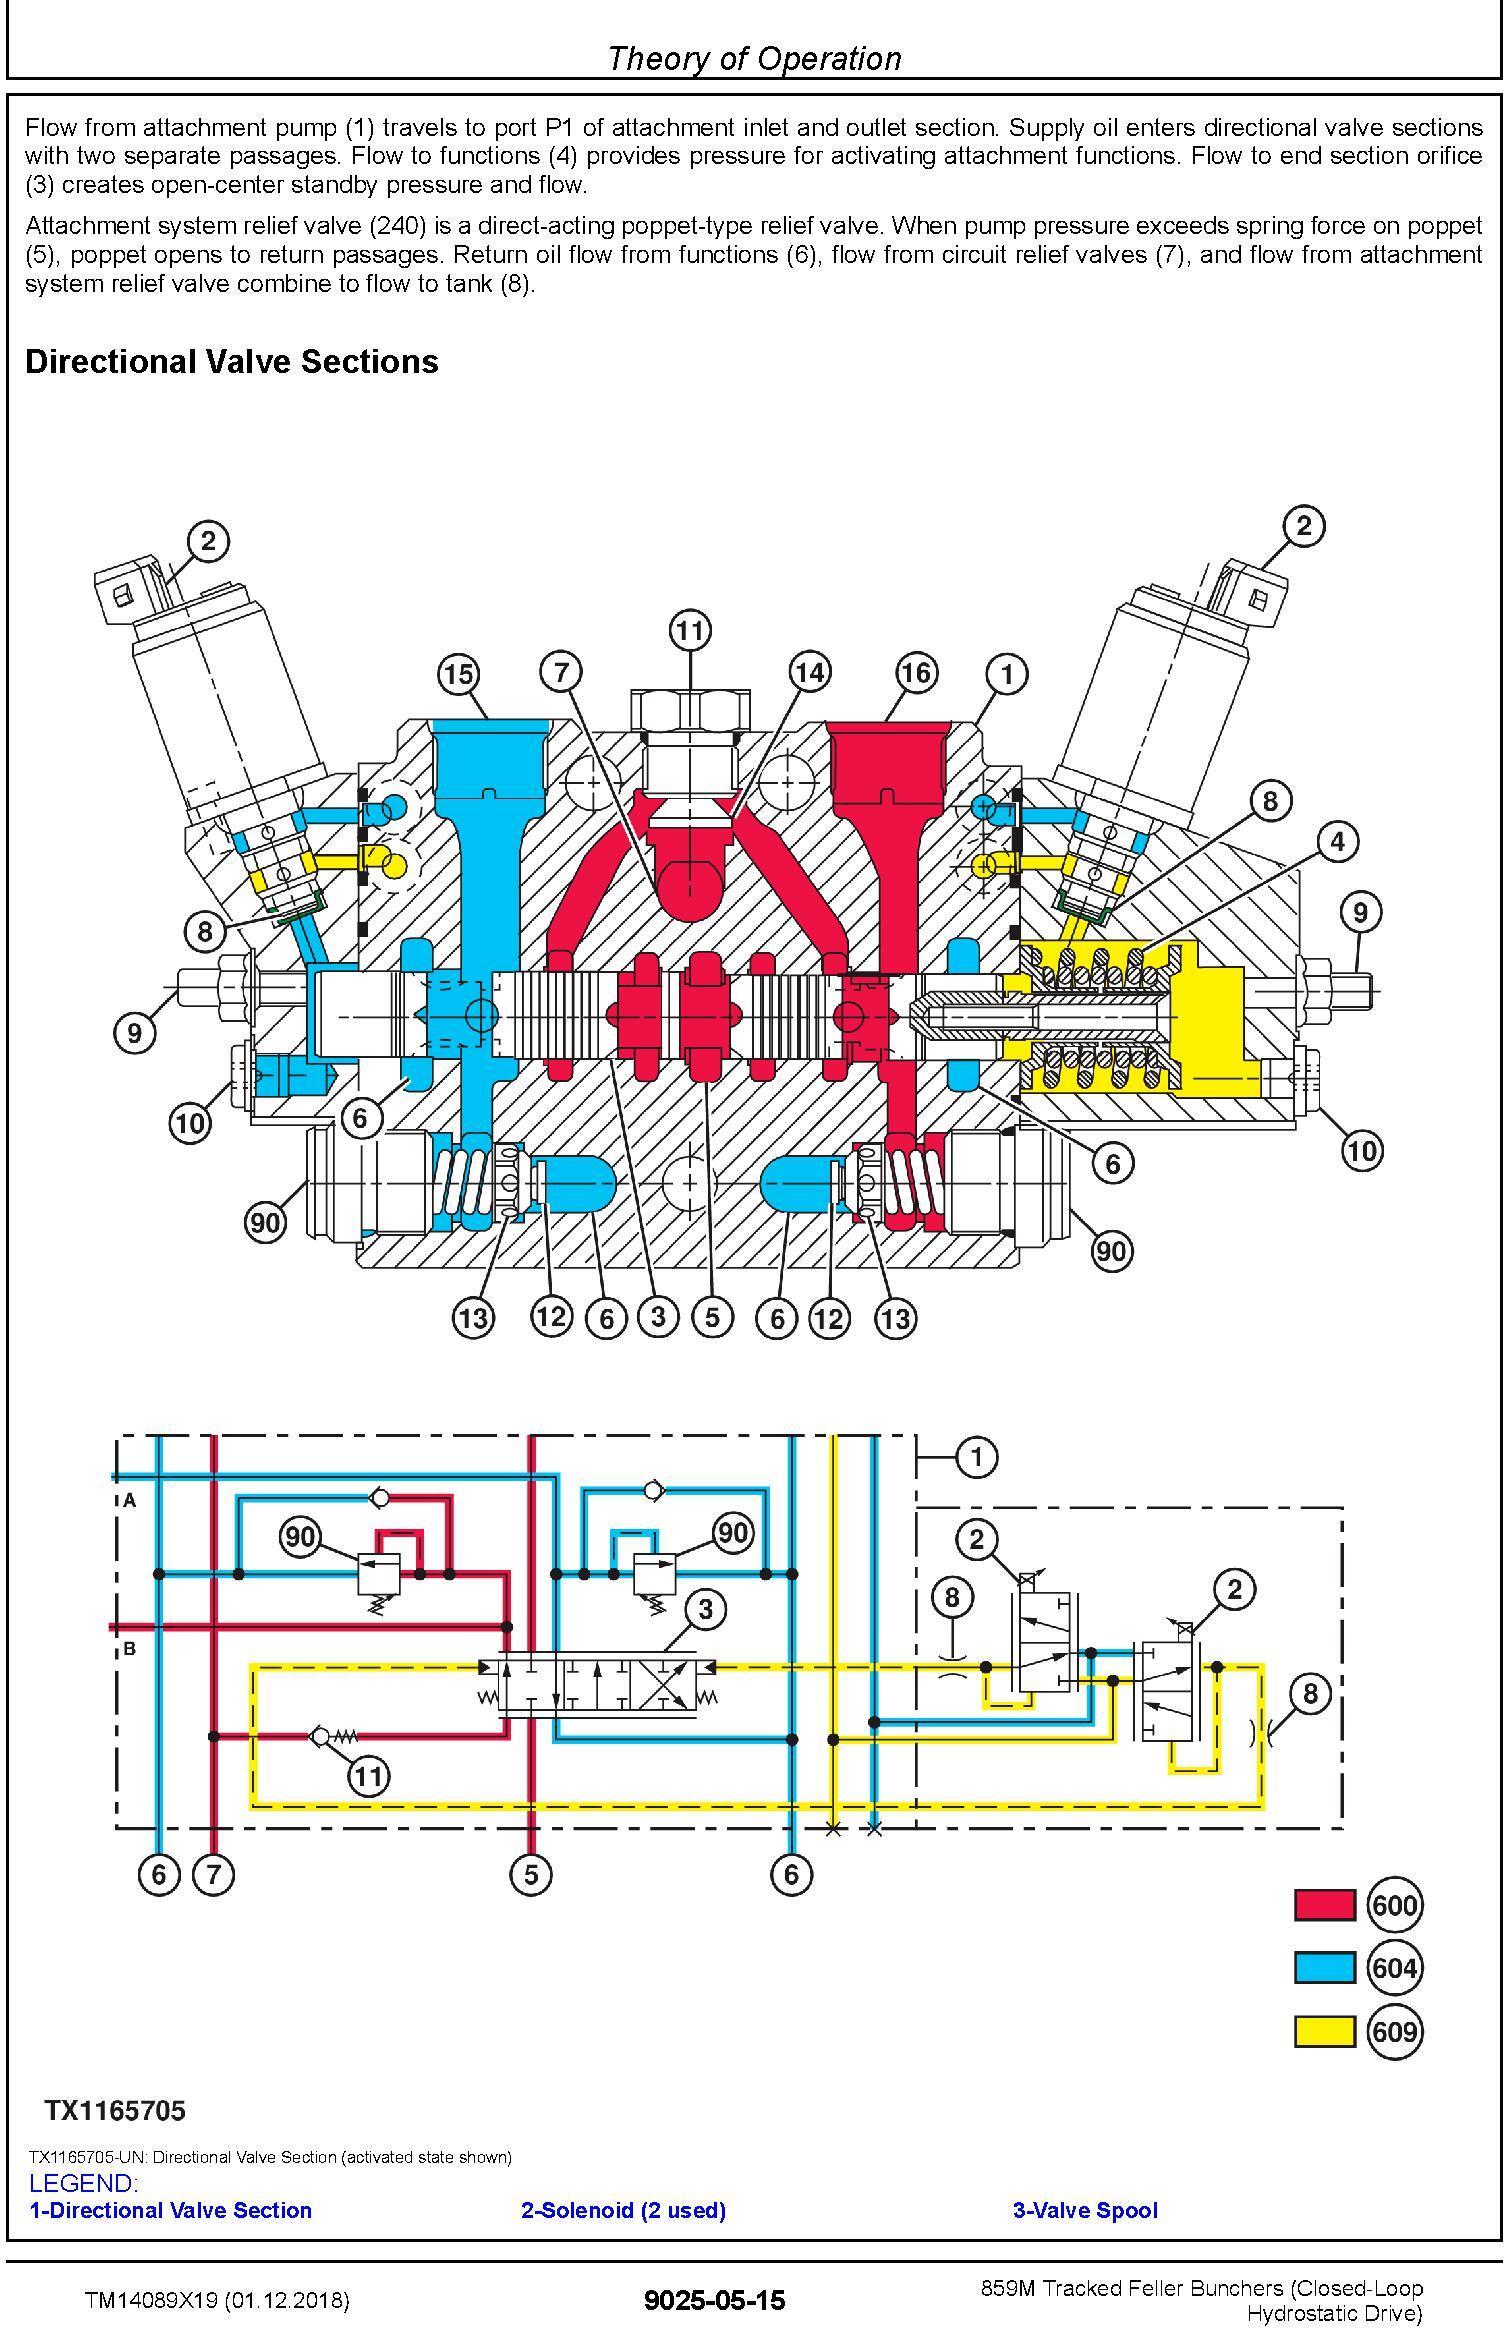 John Deere 859M (SN. F293917-,L343918-) Feller Bunchers (Closed-Loop) Diagnostic Manual (TM14089X19) - 3